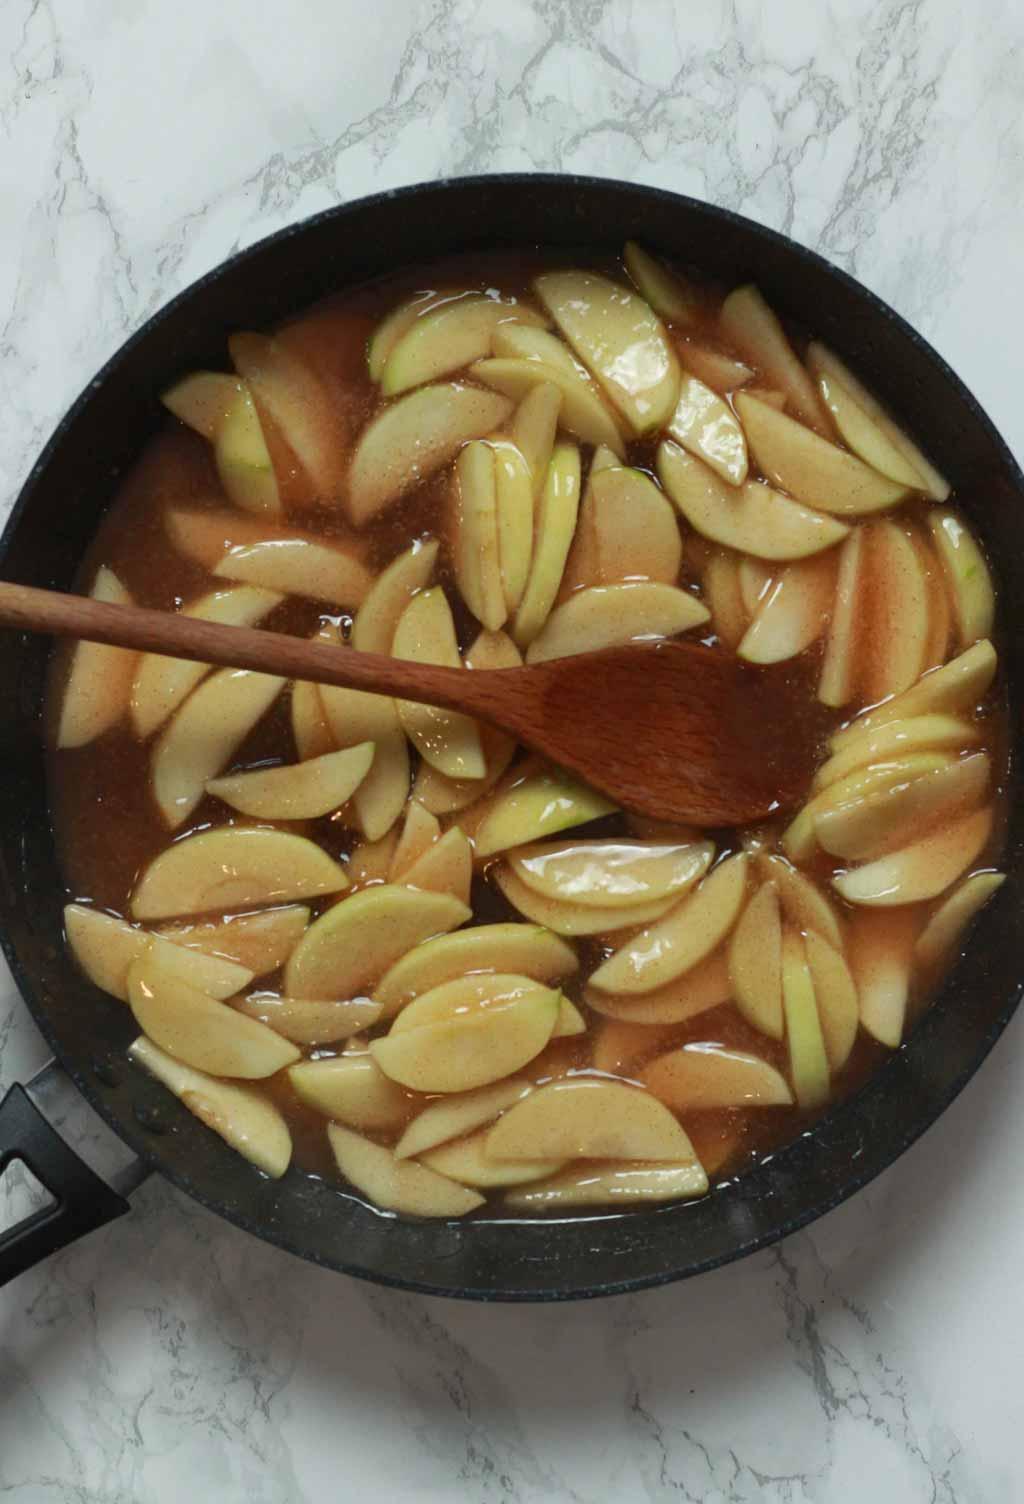 Apple Filling In A Pan